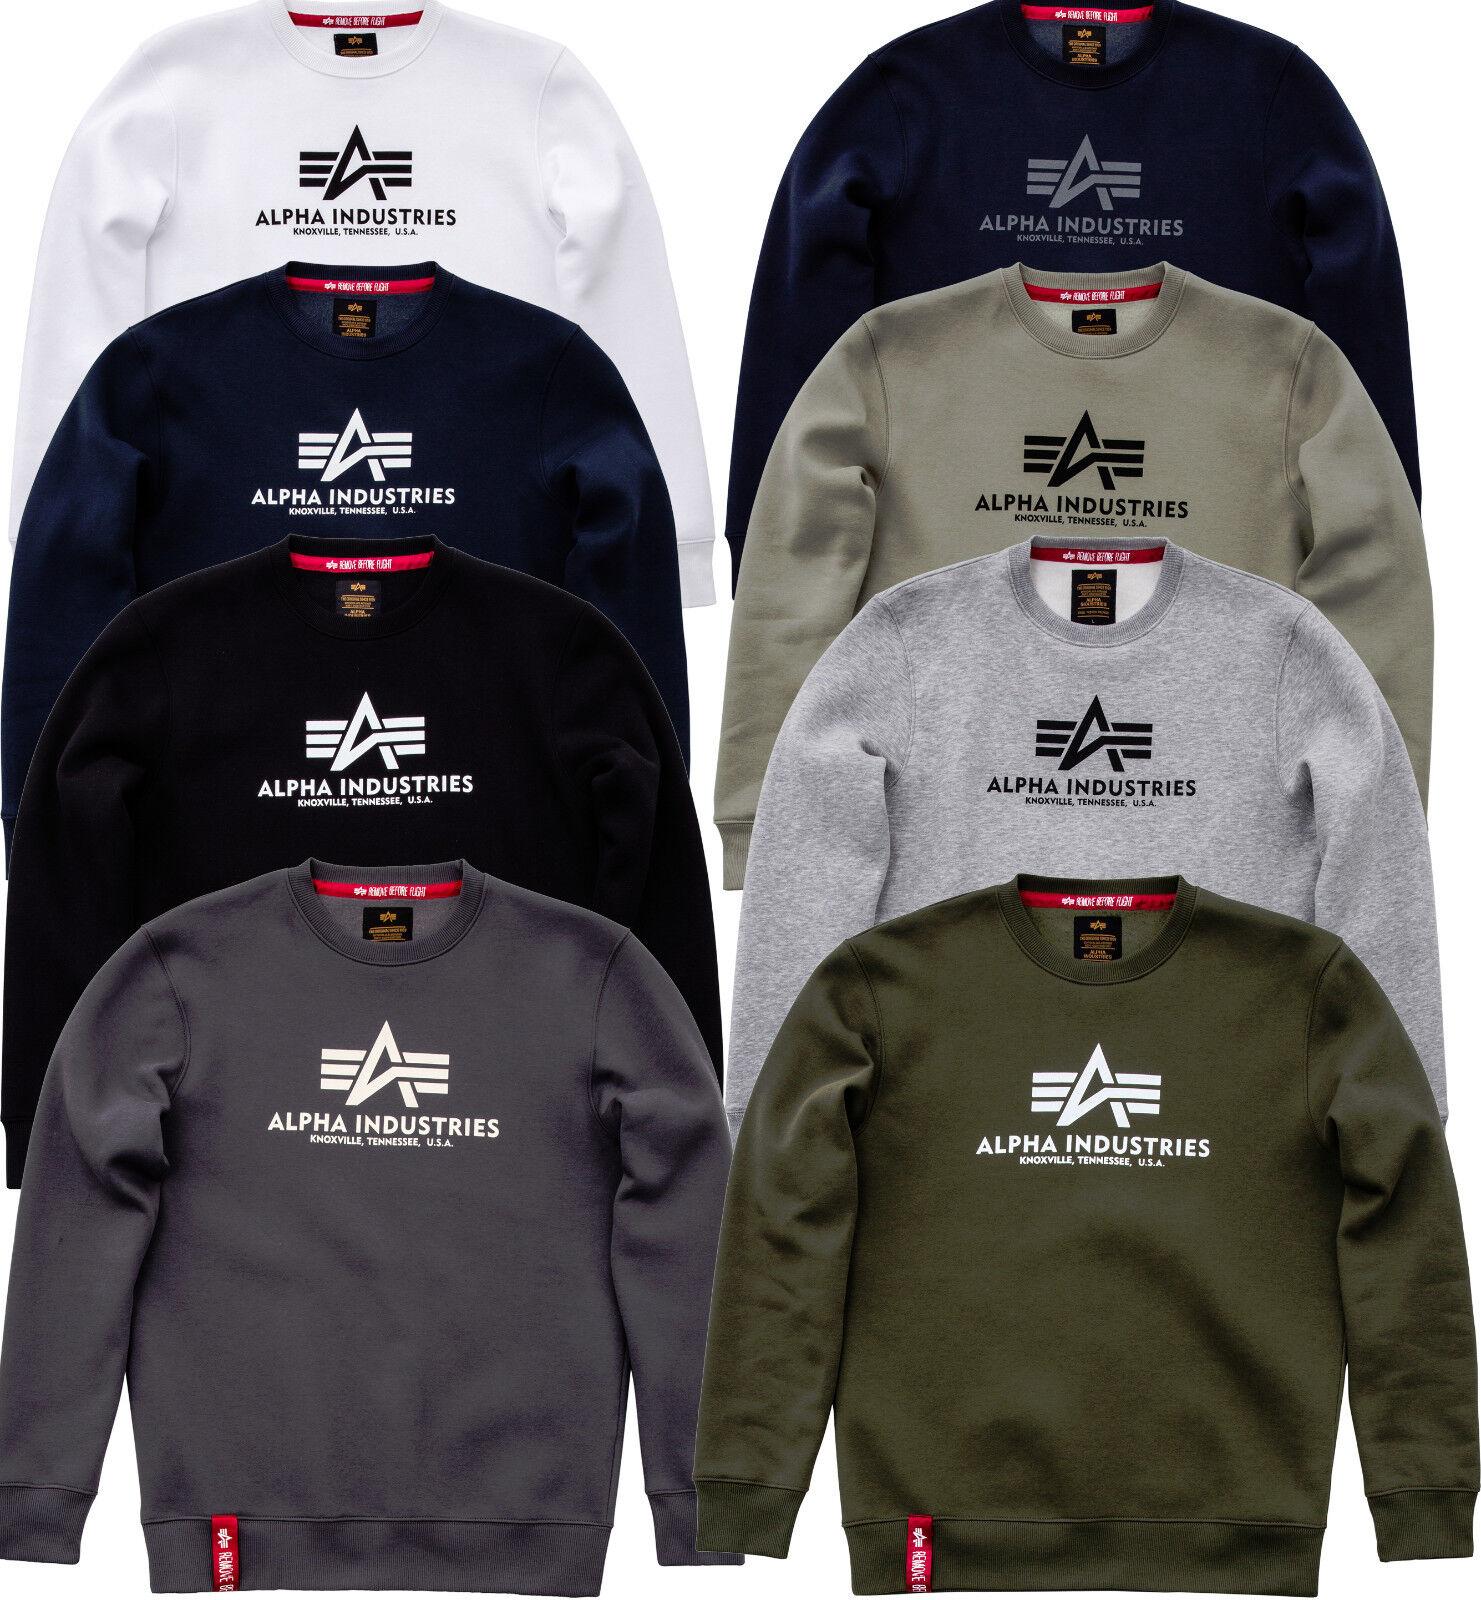 Alpha Industries Basic Pullover Sweater nero Navy bianca OLIVE grigio 178302